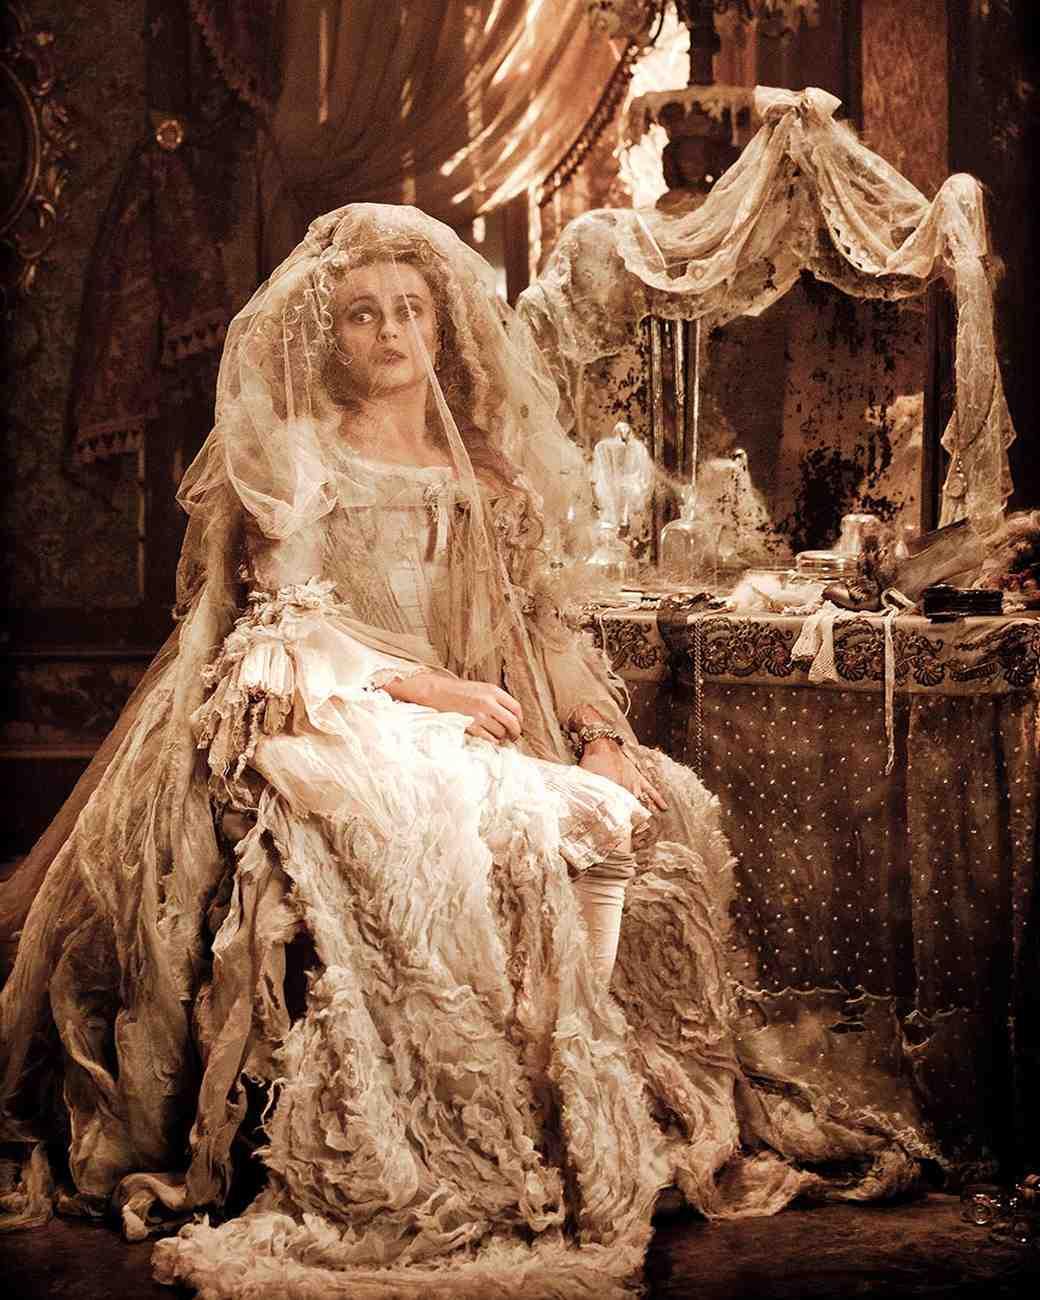 movie-wedding-dresses-great-expectations-helena-bonham-carter-0316.jpg